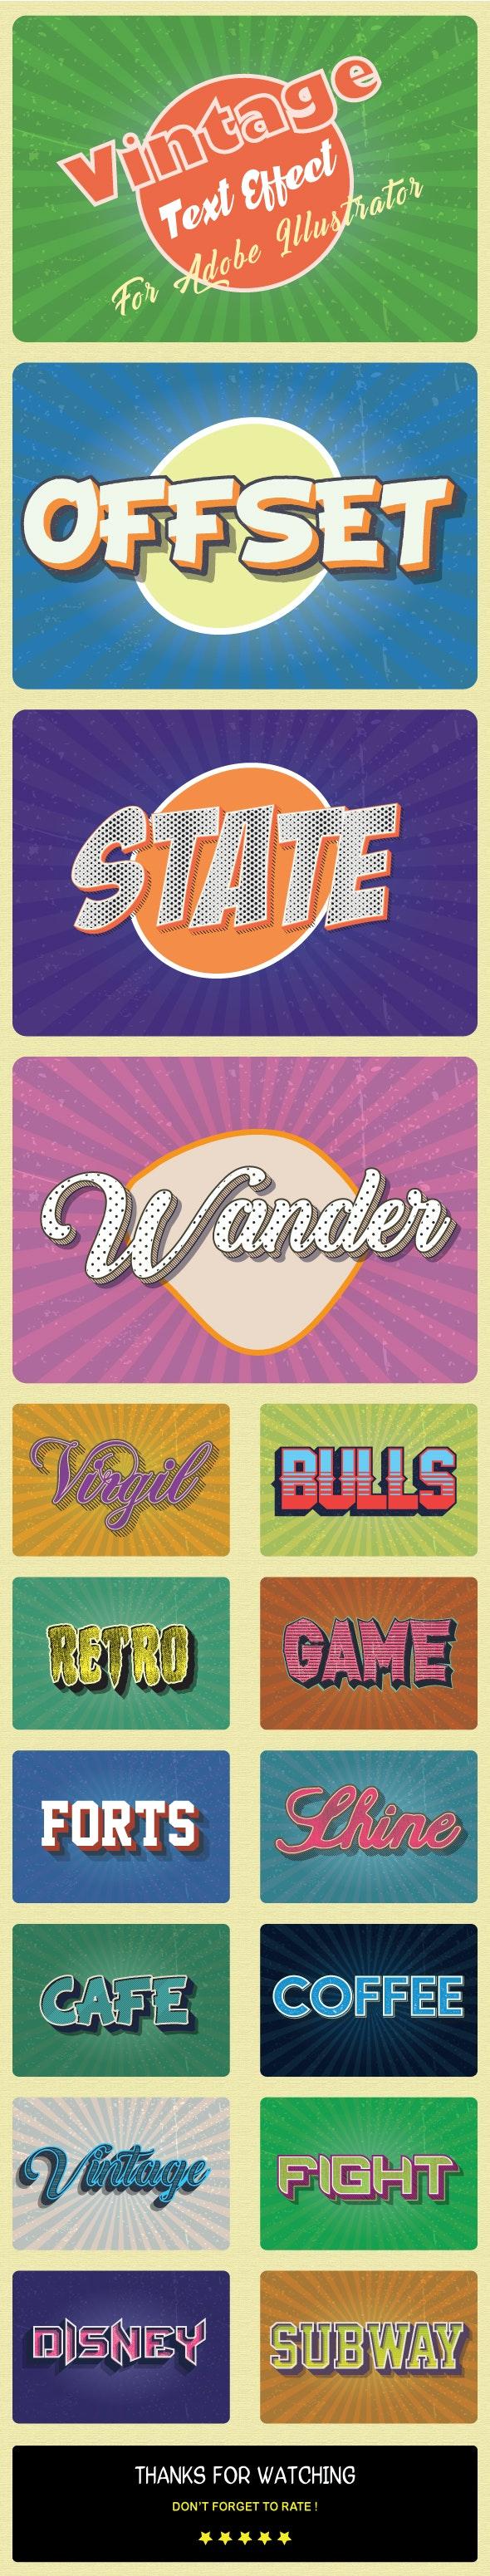 Vintage Text Effect For Adobe Illustrator - Styles Illustrator